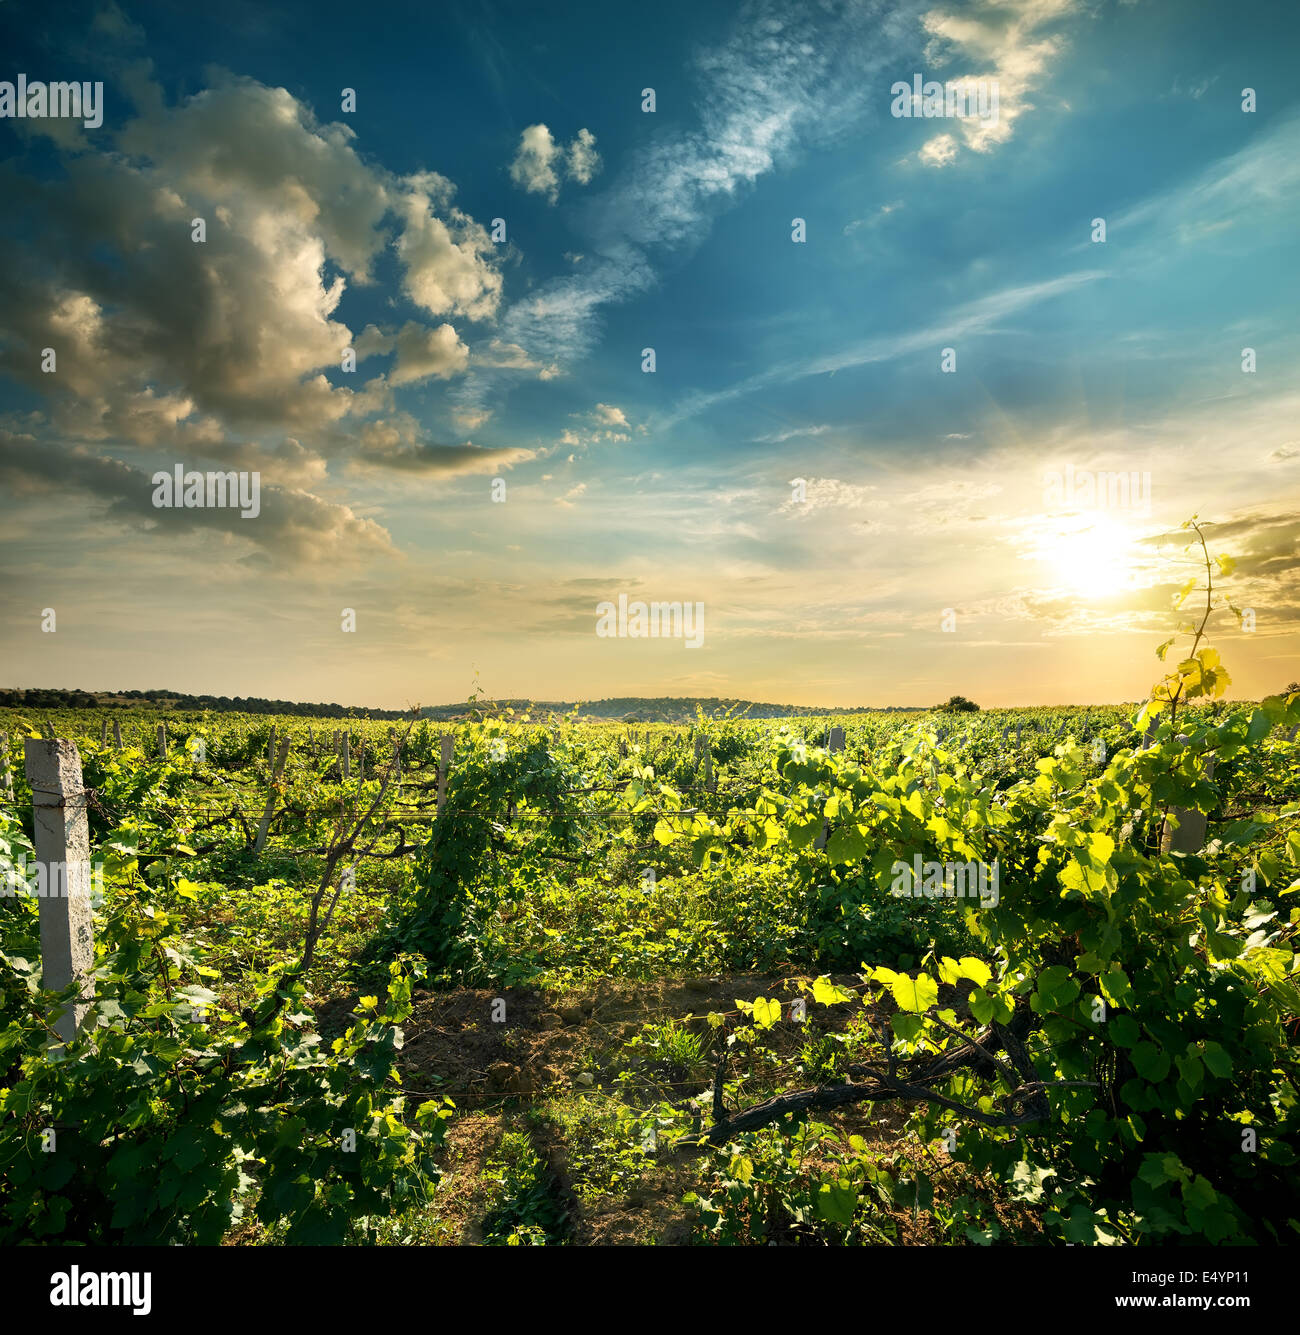 Green grape field in the evening sun - Stock Image